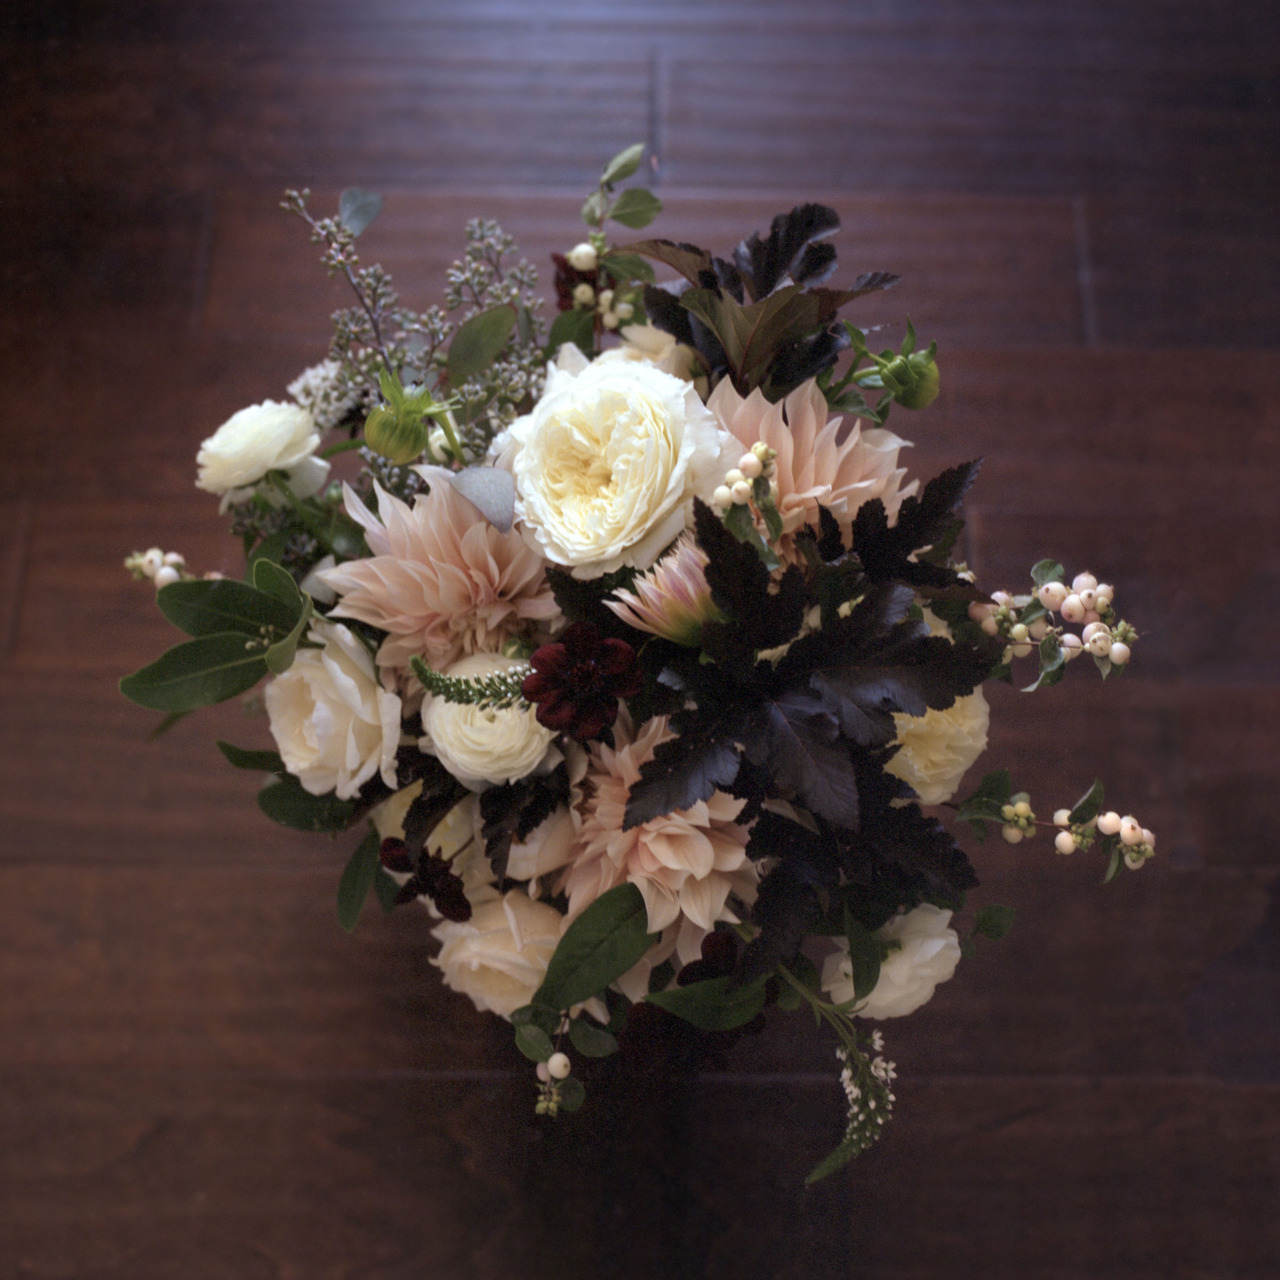 Bouquet   Portland, OR   September 20, 2014